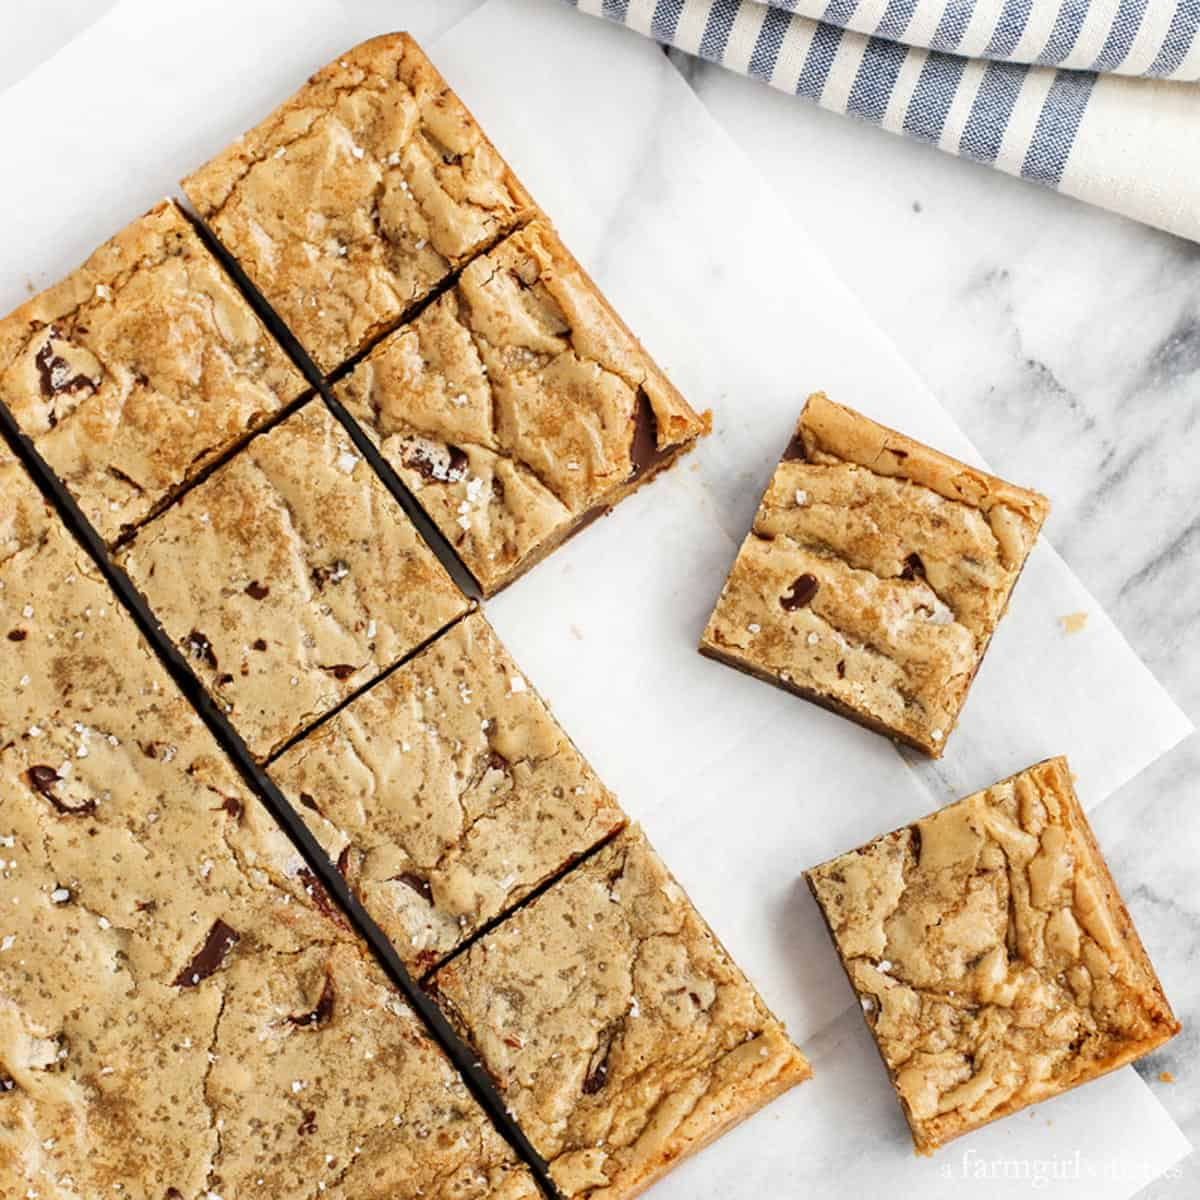 One-Bowl-Almond-Chocolate-Chunk-Blondies-with-Sea-Salt_AFarmgirlsDabbles_AFD-4-sq